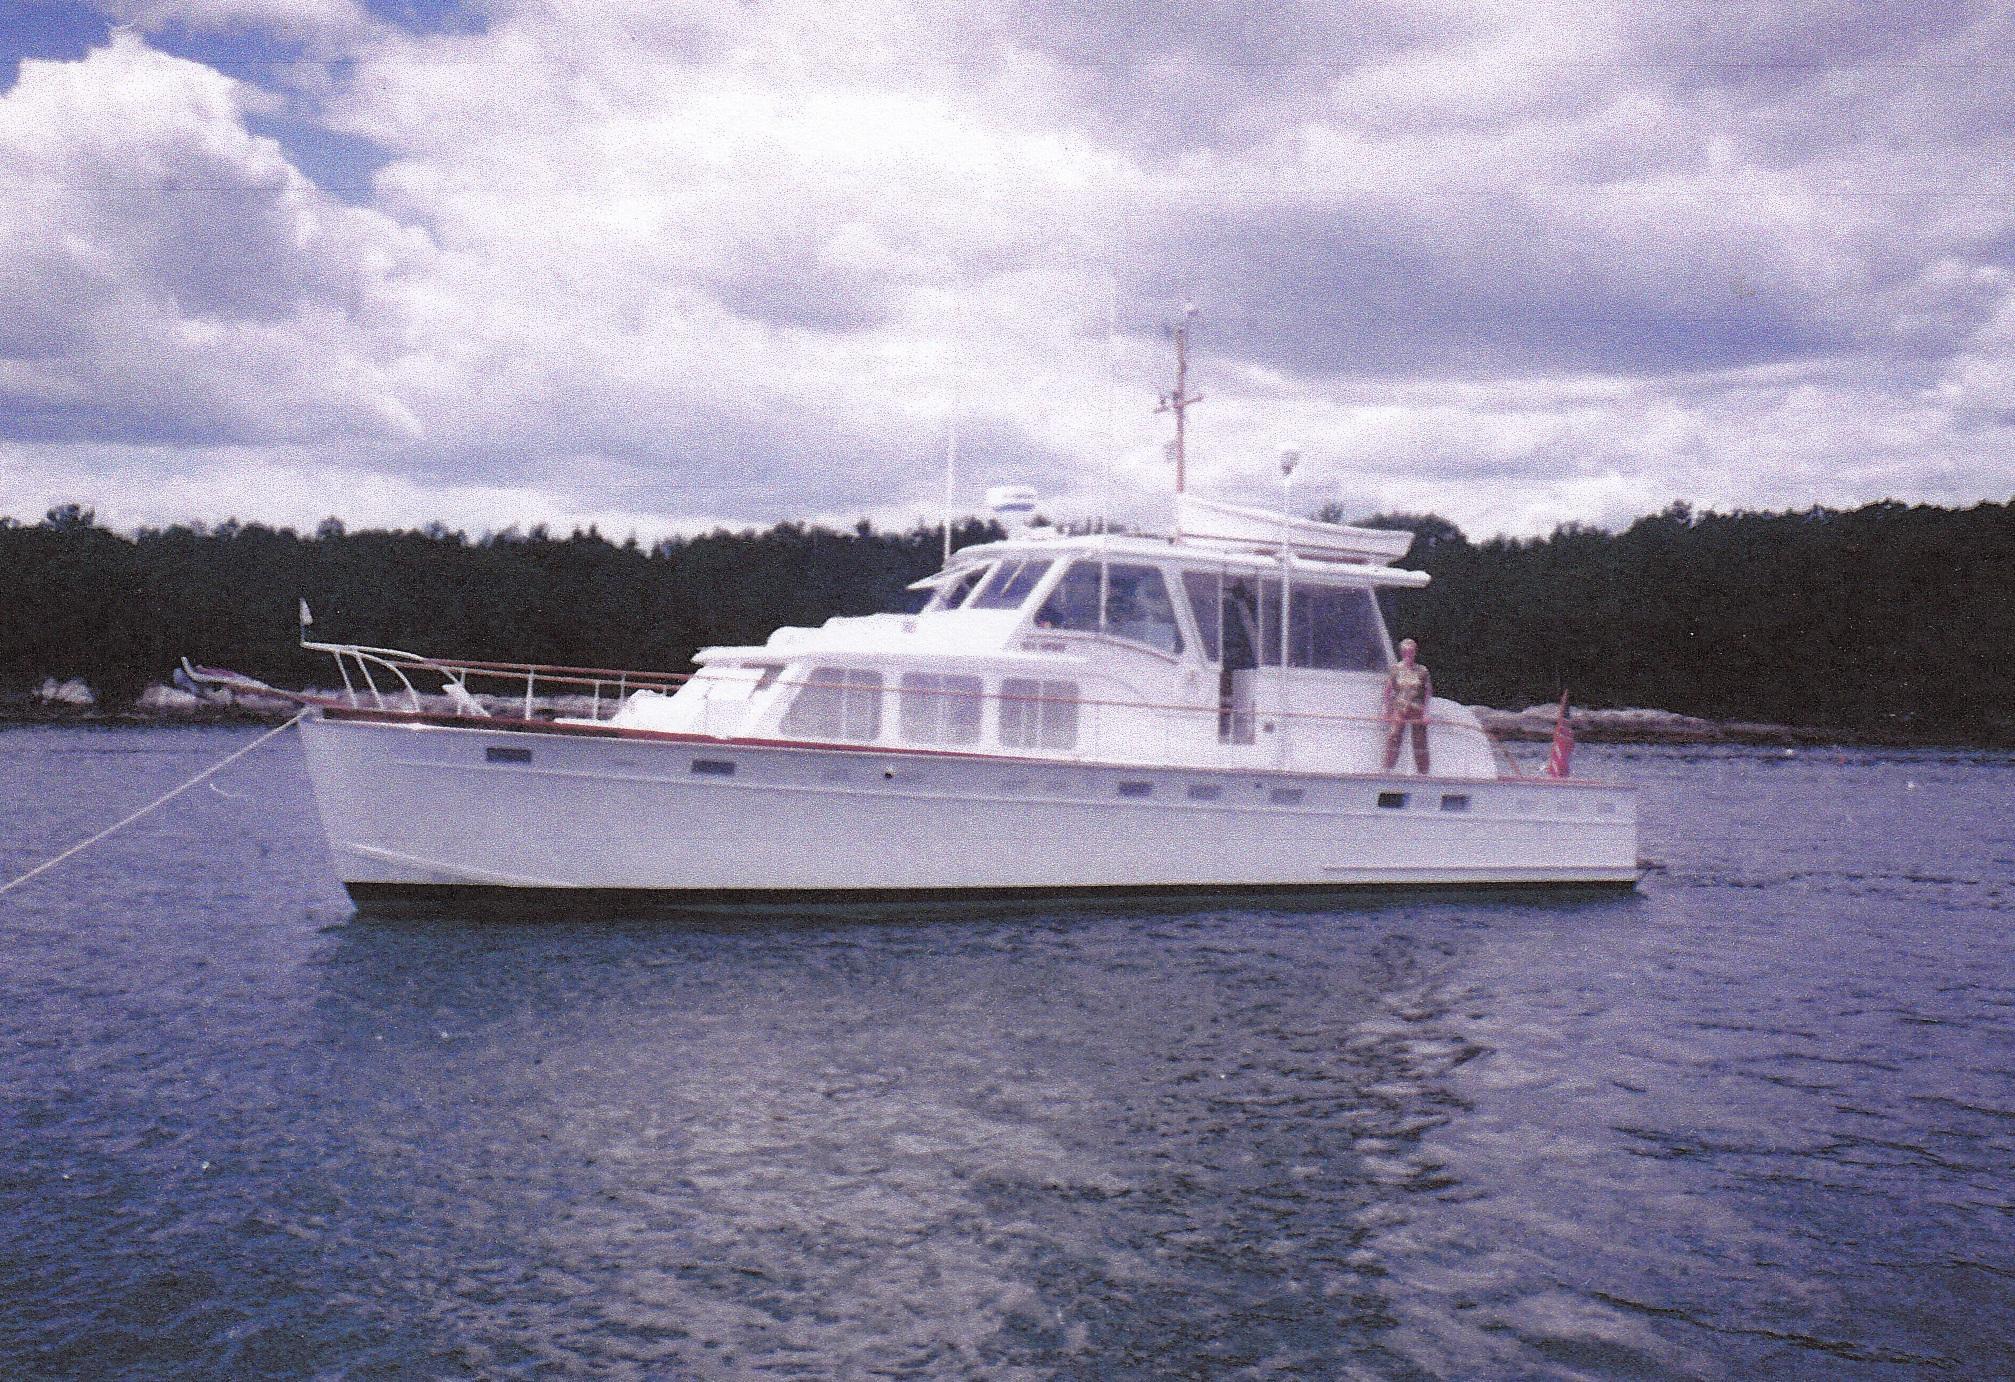 1963 Huckins Linwood 53 Motoryacht Power Boat For Sale